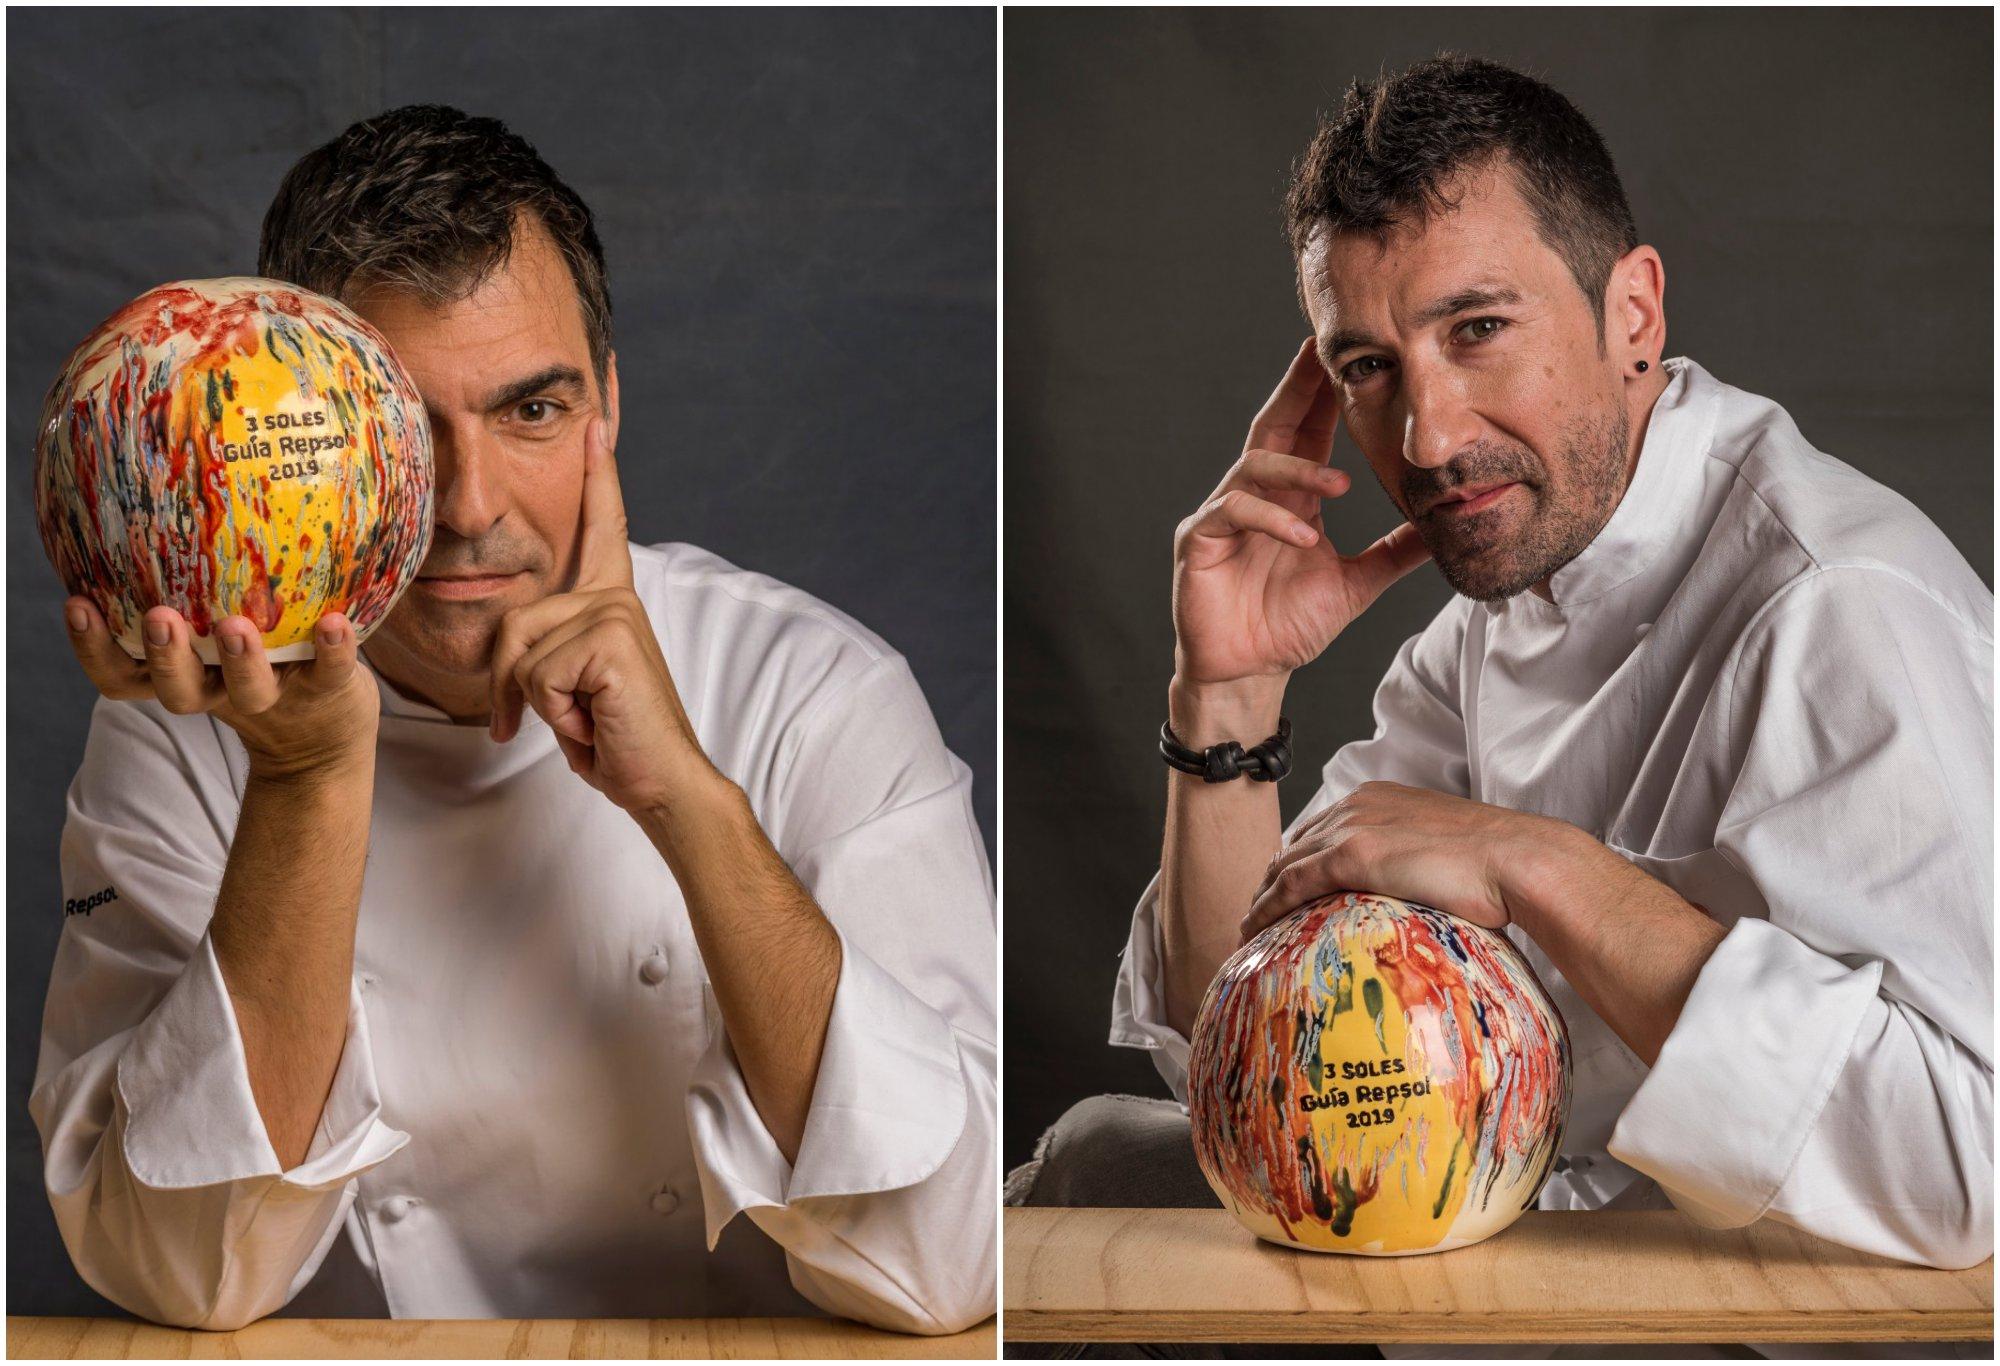 Los 3 Soles Guía Repsol: Ramón Freixa ('Ramón Freixa Madrid) y Eneko Atxa ('Azurmendi')